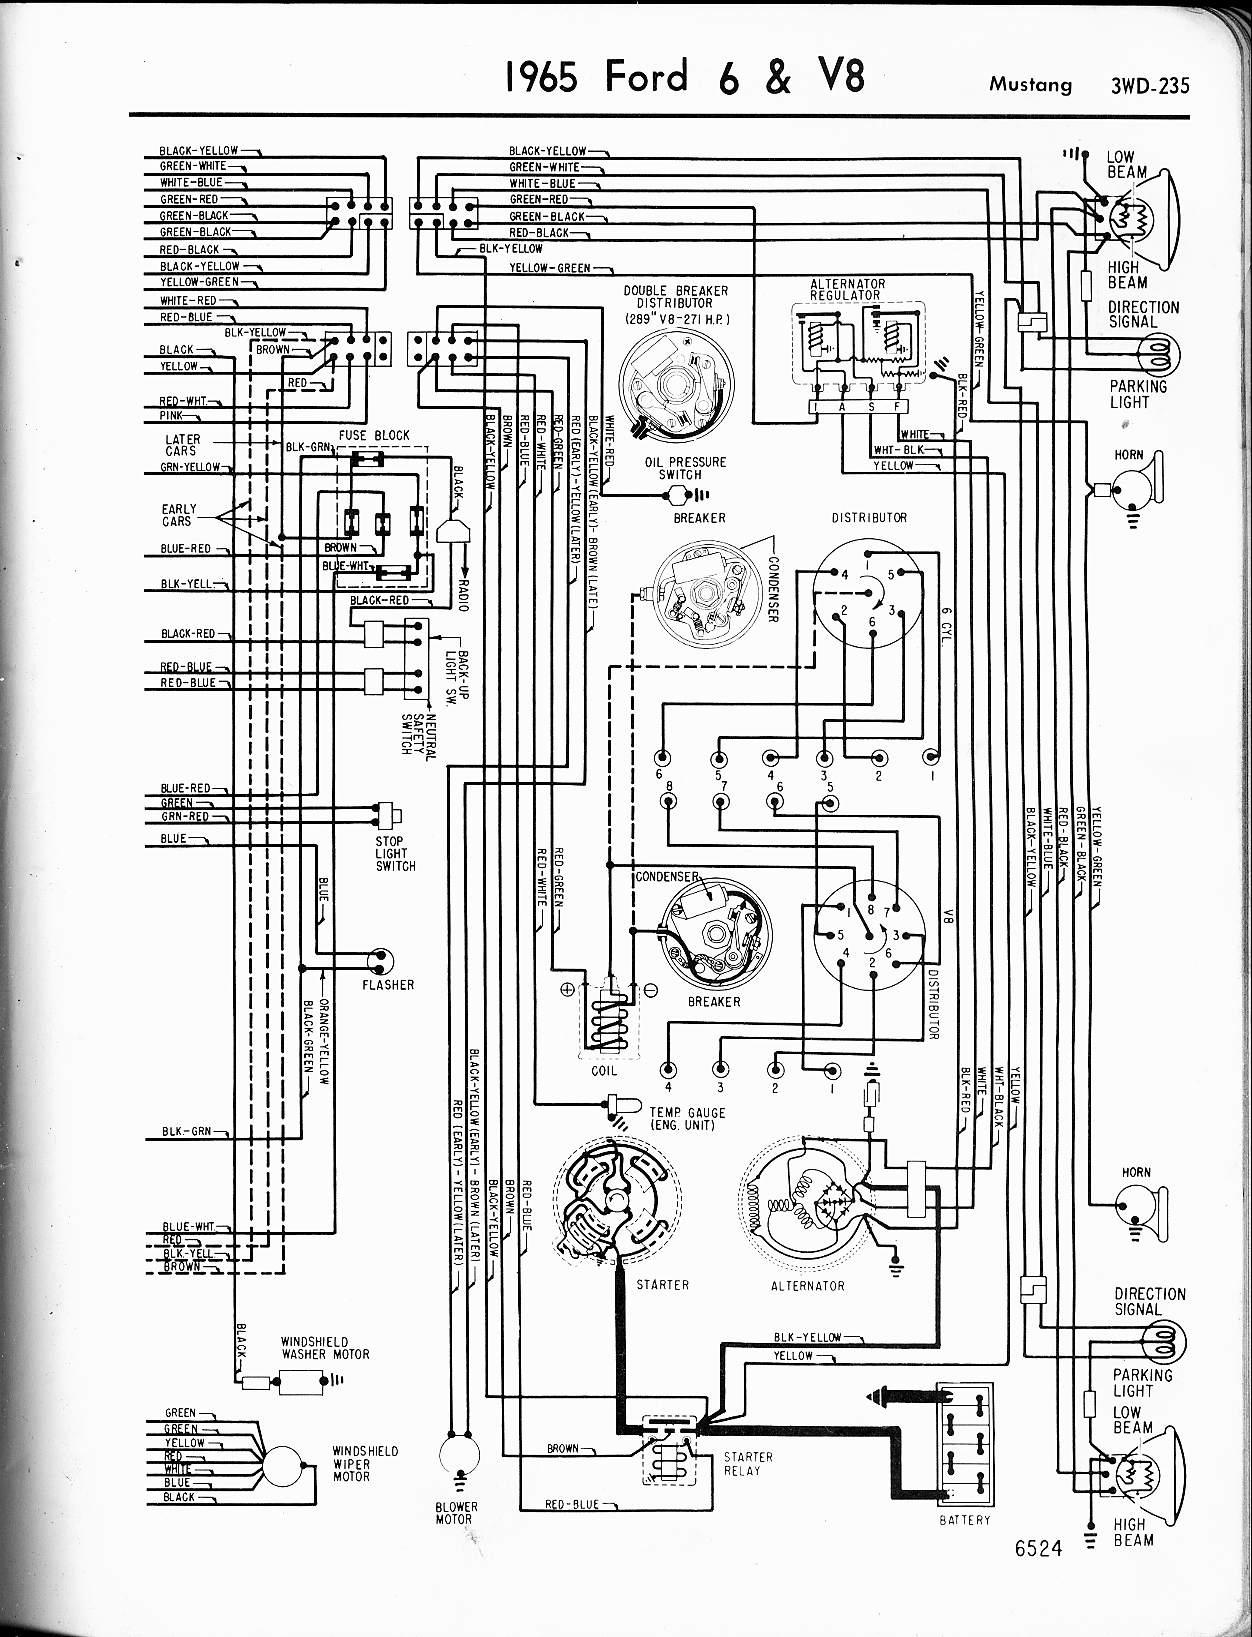 1965 mustang 289 engine diagram